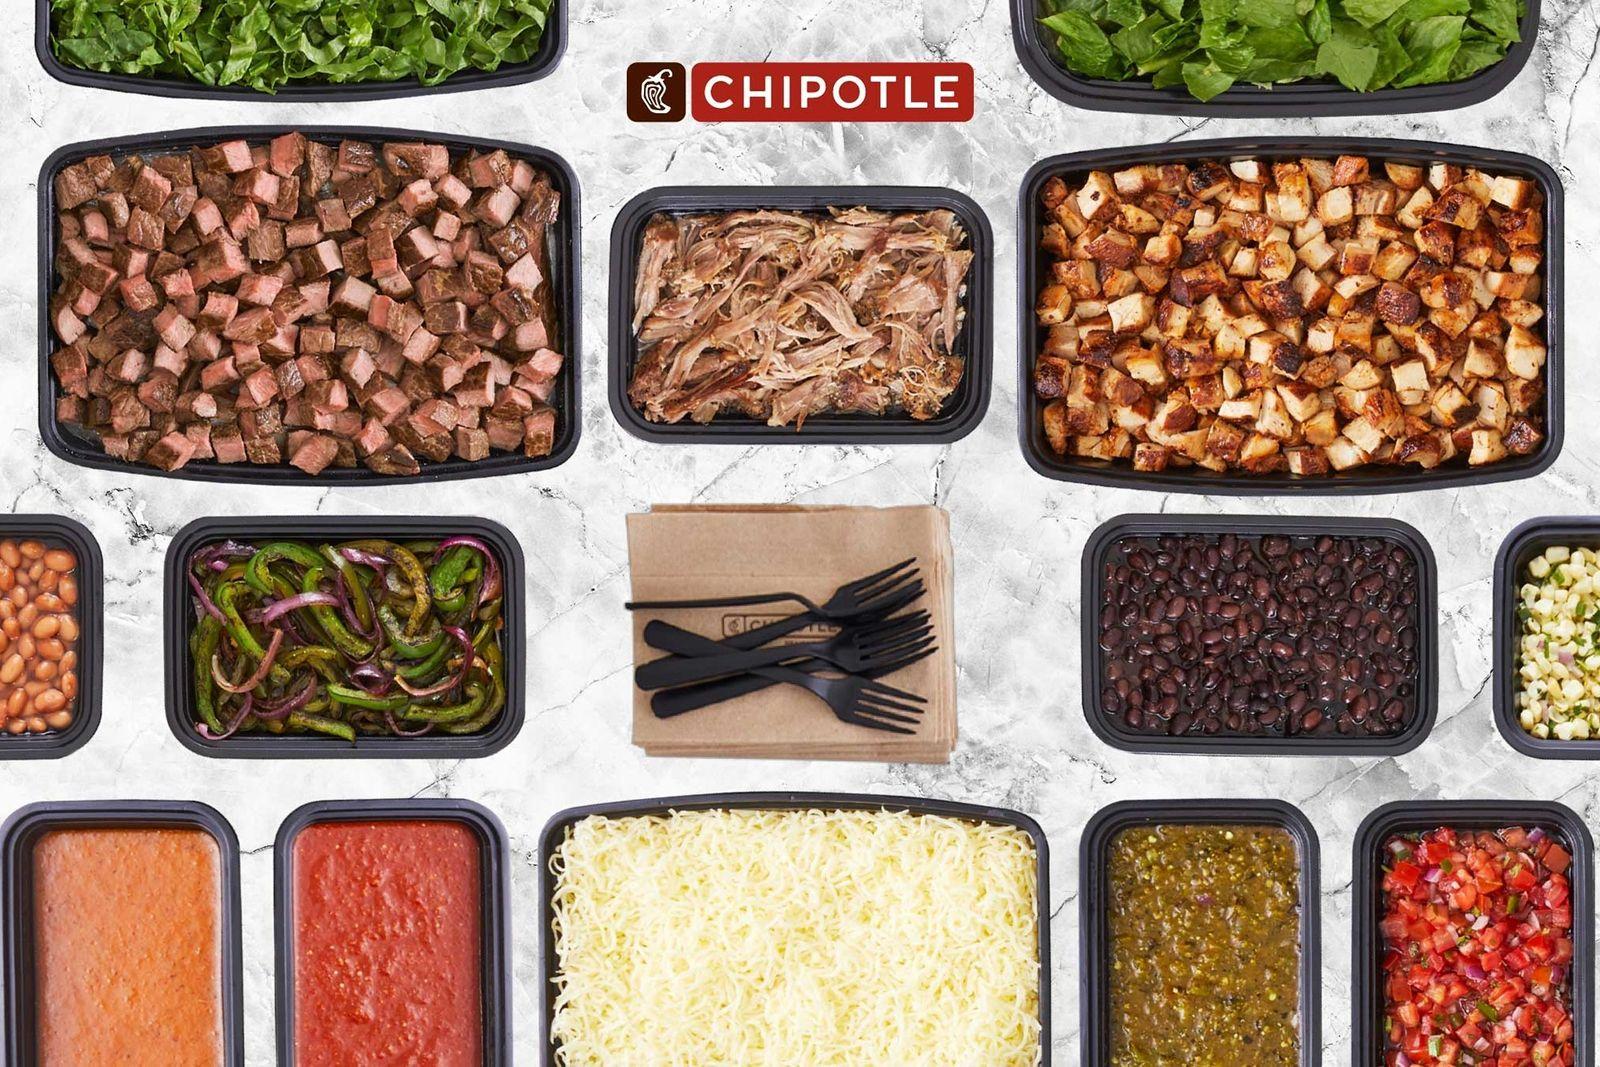 Chipotle Catering Turns Summer Bikini Season into Burrito Season